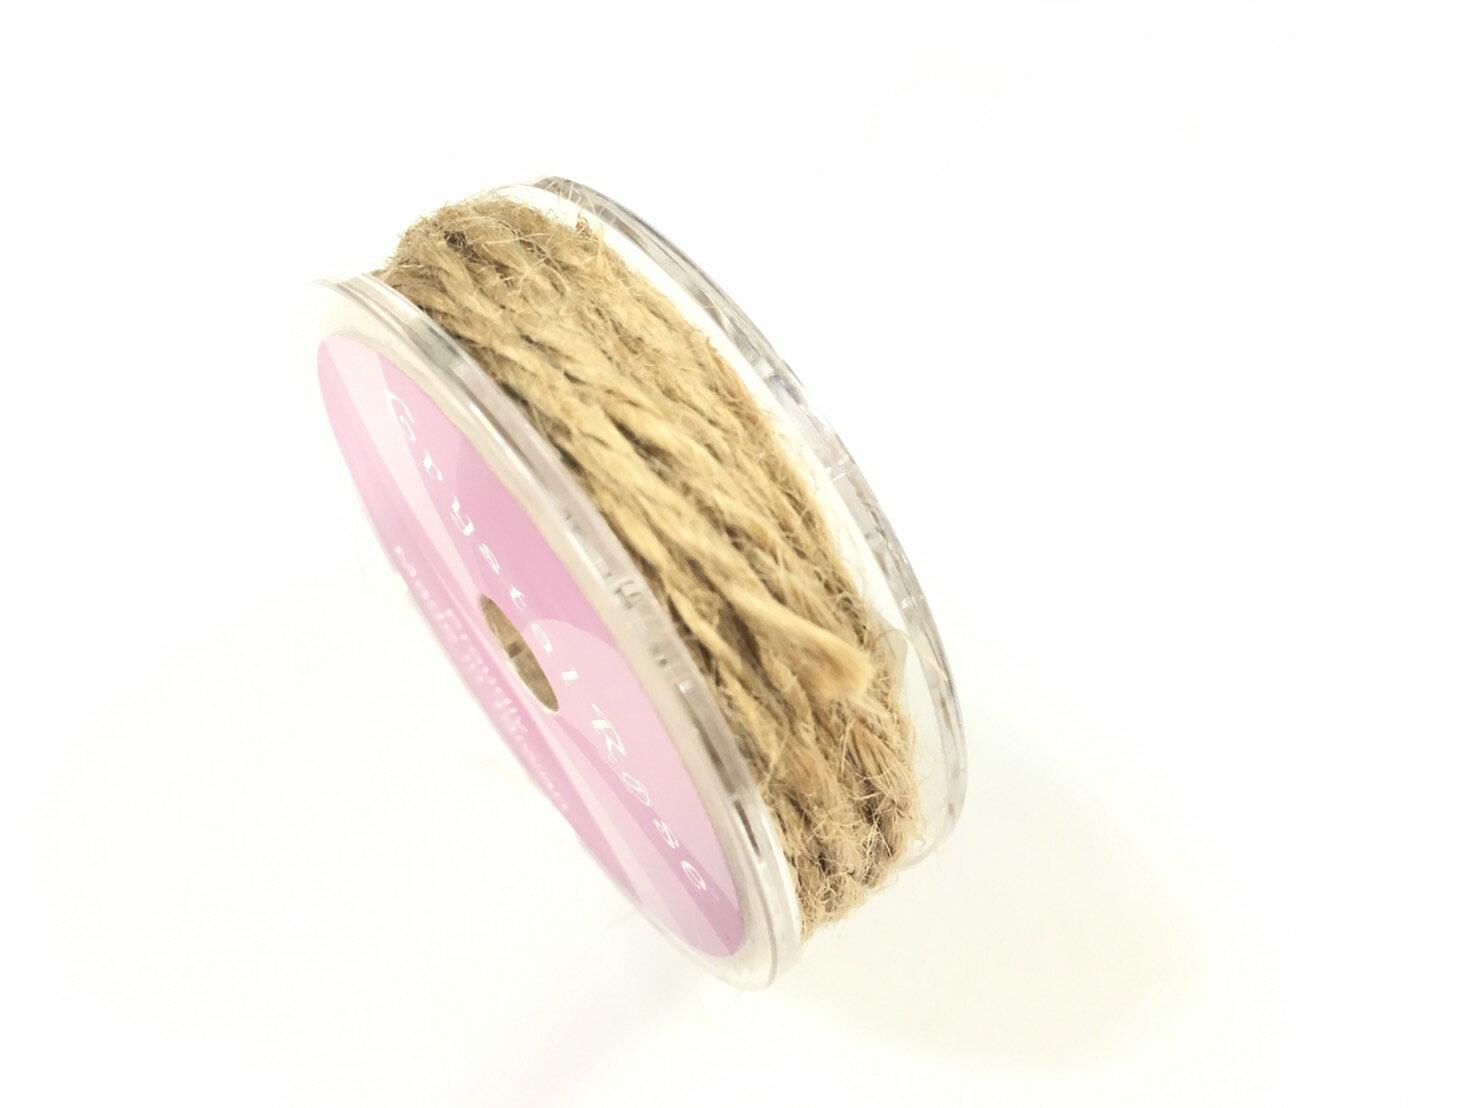 【Crystal Rose緞帶專賣店】單色素麻繩 2mm 5碼裝 (15色) 7